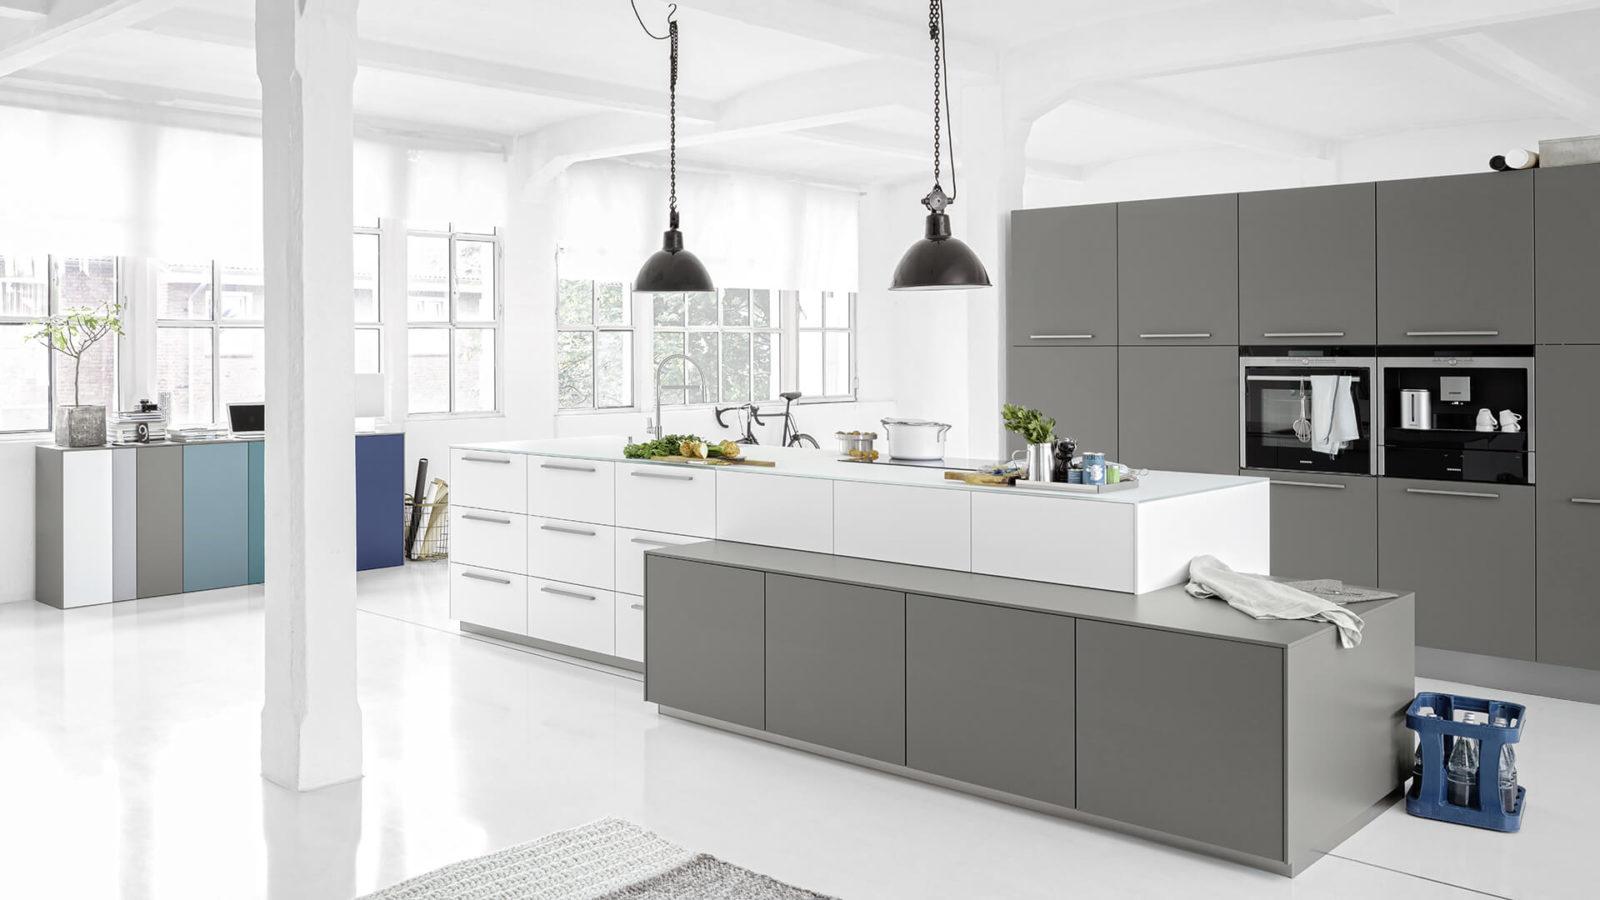 la cuisine de vlad et mila elton. Black Bedroom Furniture Sets. Home Design Ideas